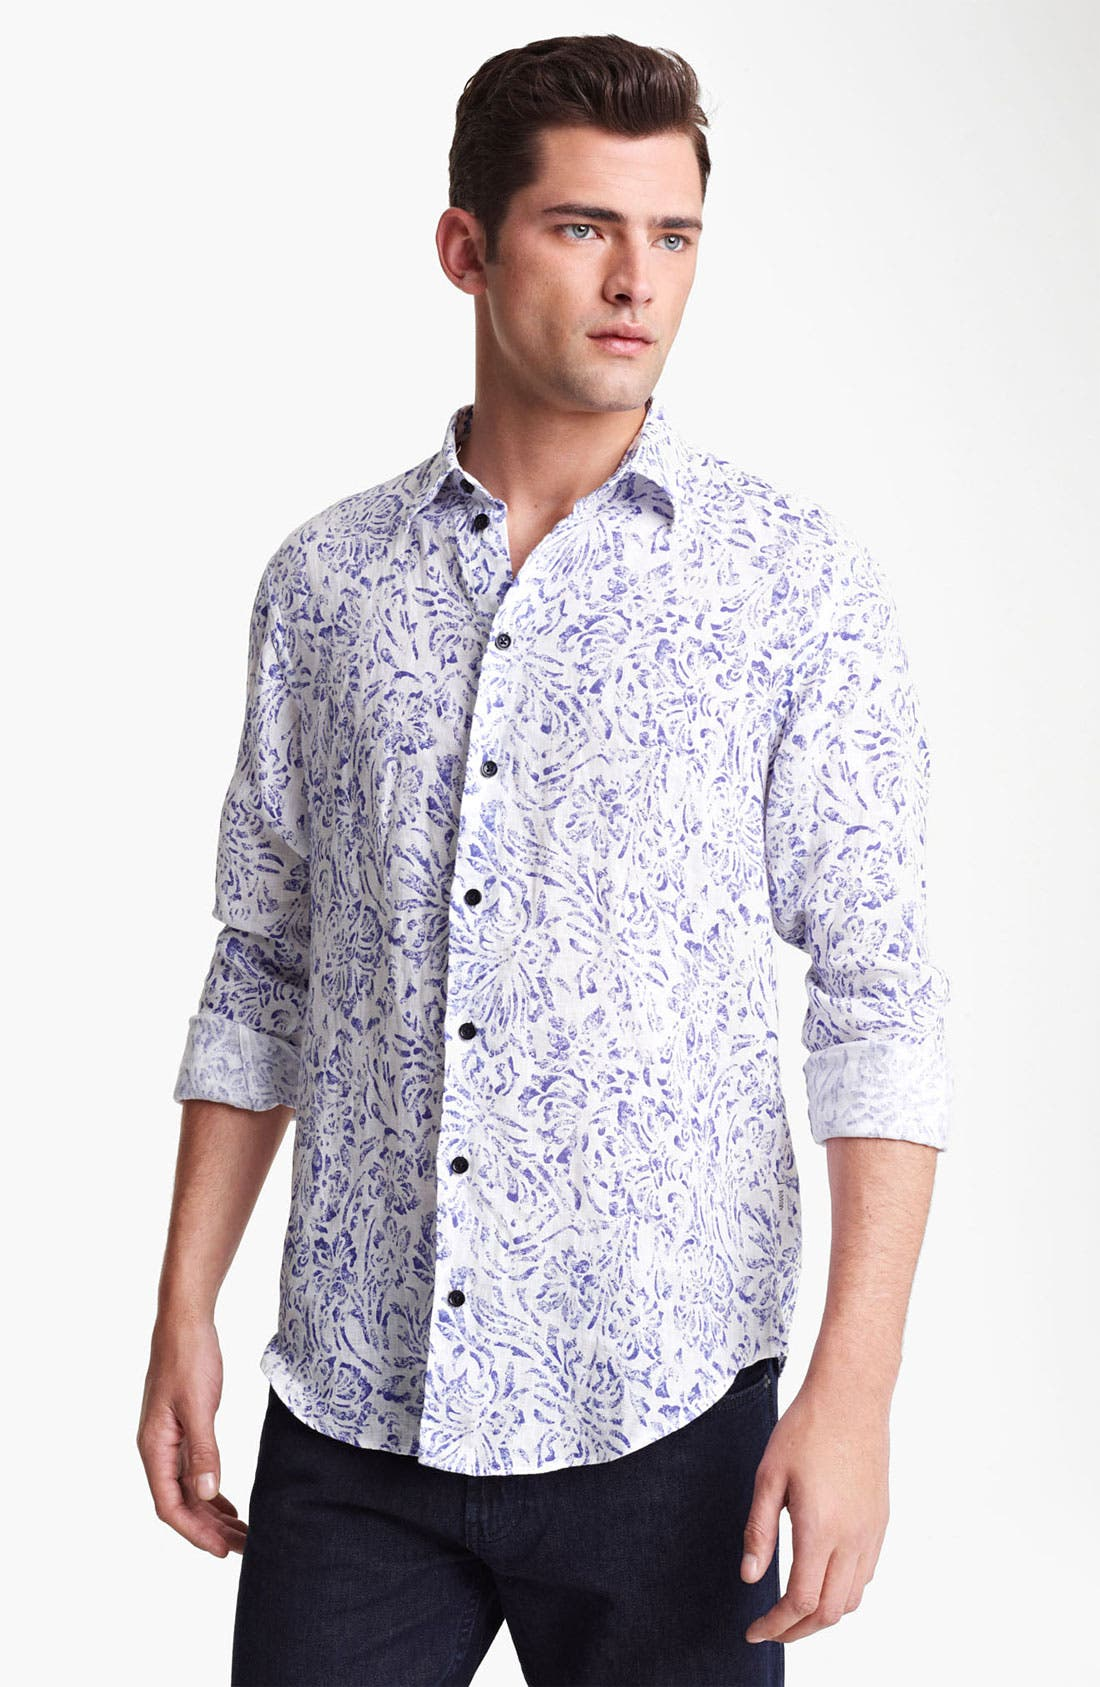 Alternate Image 1 Selected - Armani Collezioni Floral Print Linen Sport Shirt